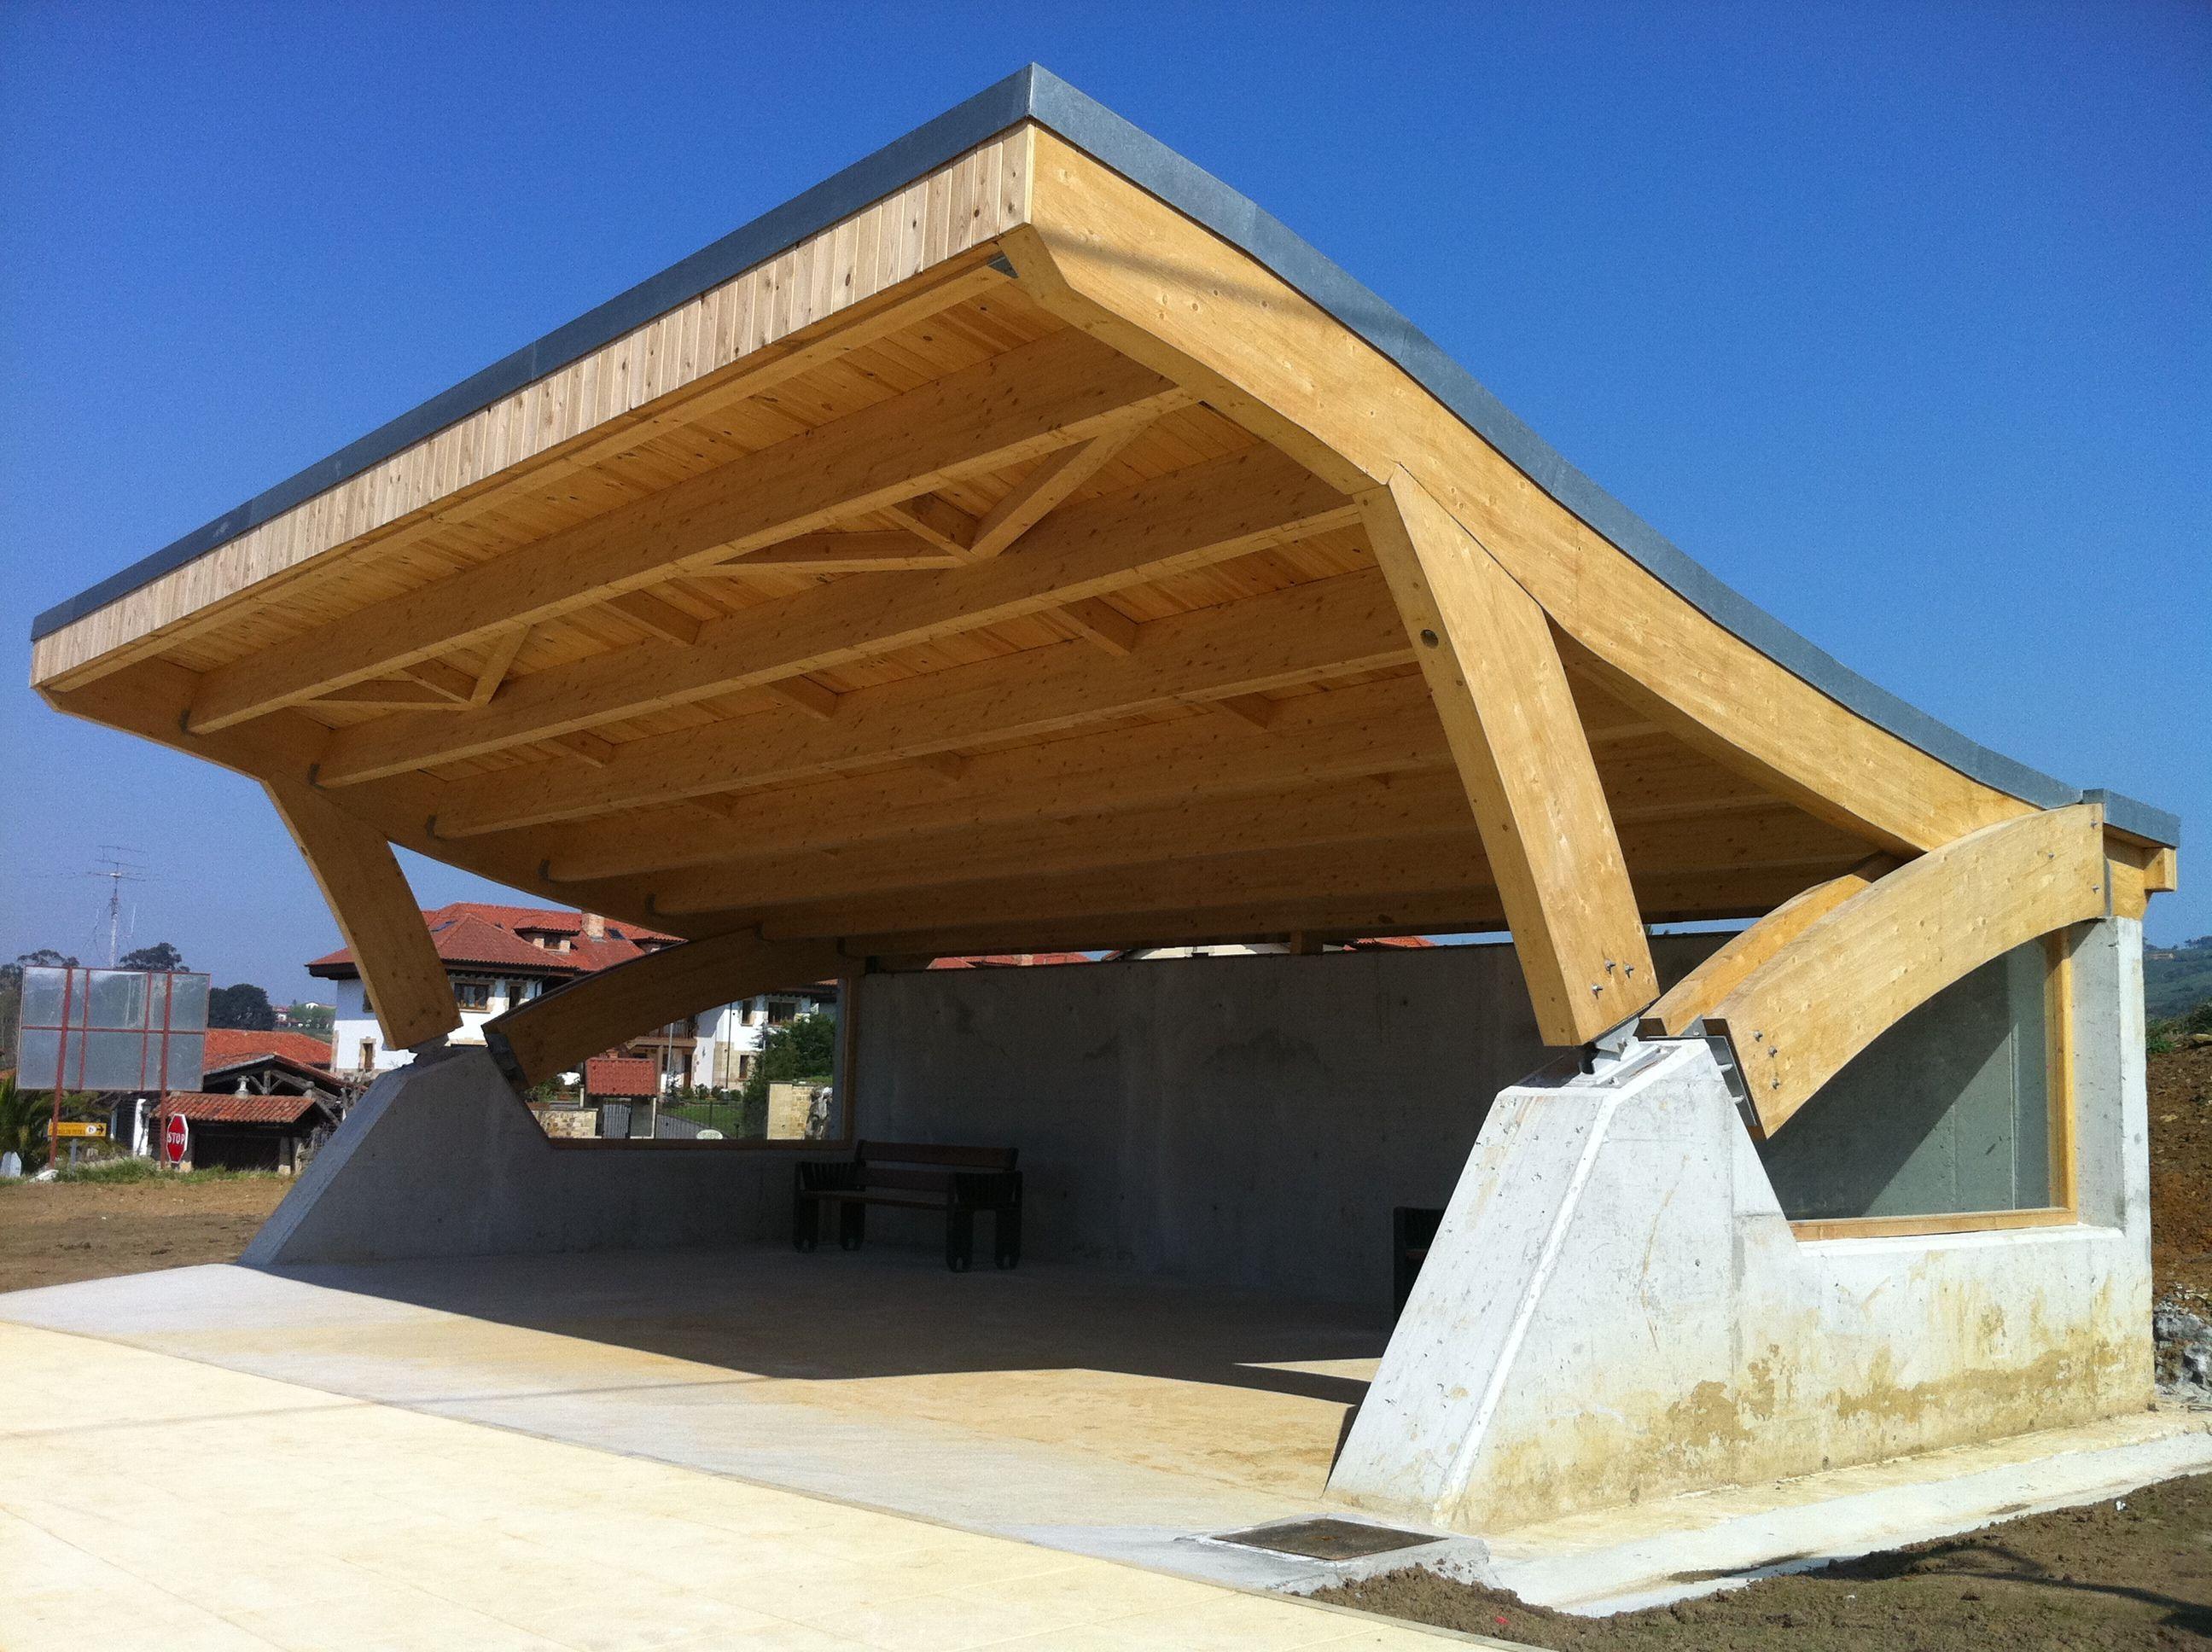 marquesina de madera laminada con cubierta curva www